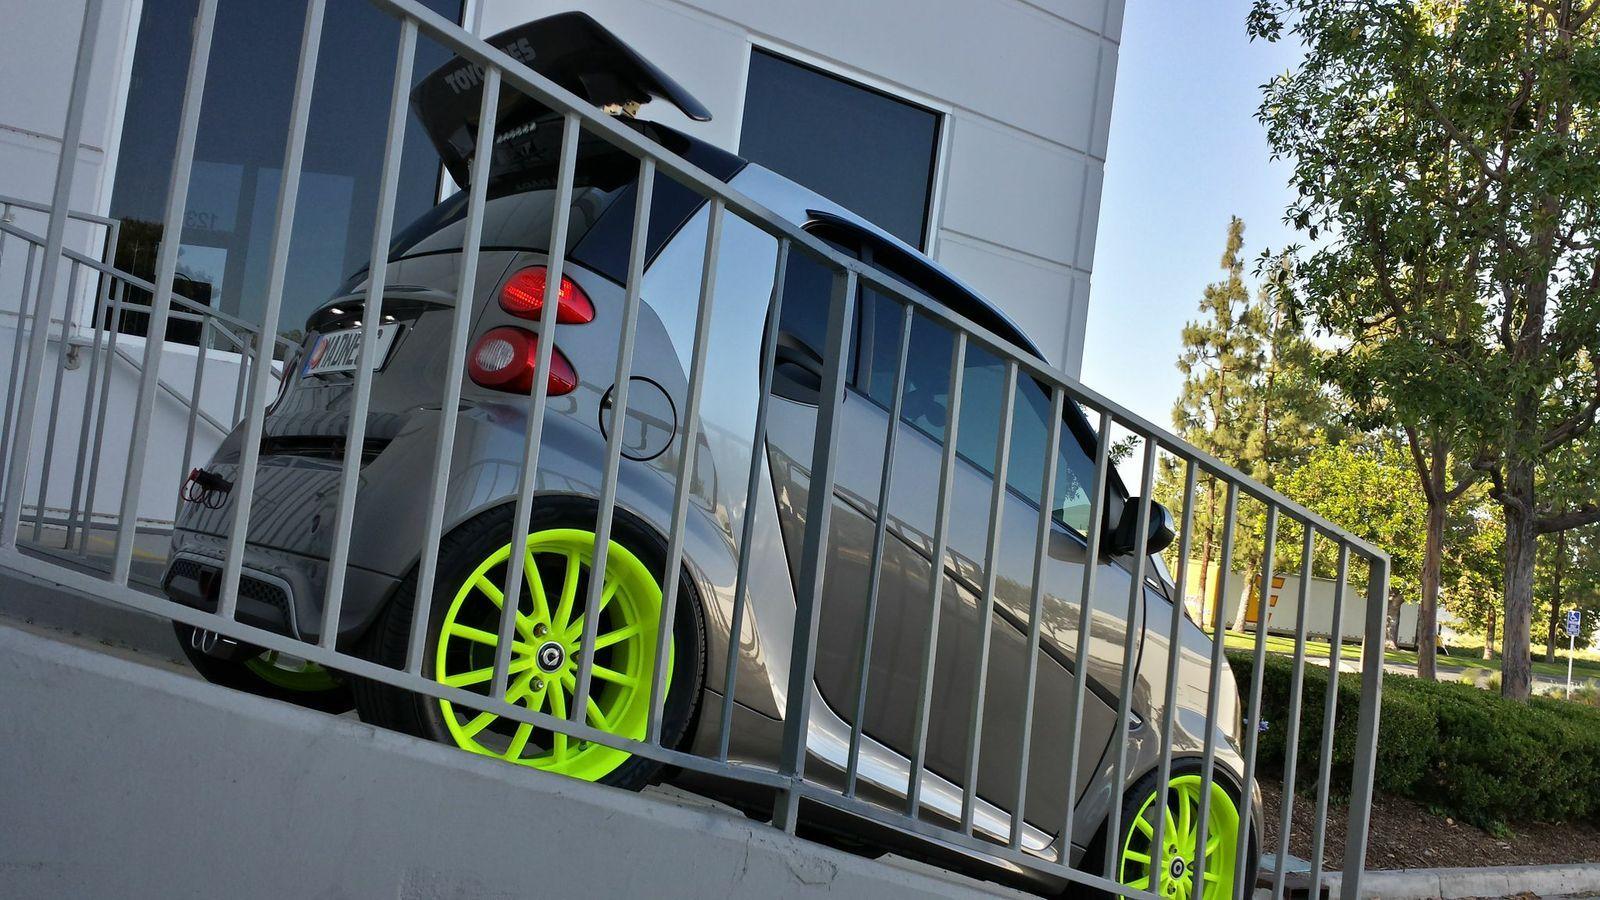 Genius Wheel 17x7 5 5 17x6 5 22 Smart Car Car Wheels Smart